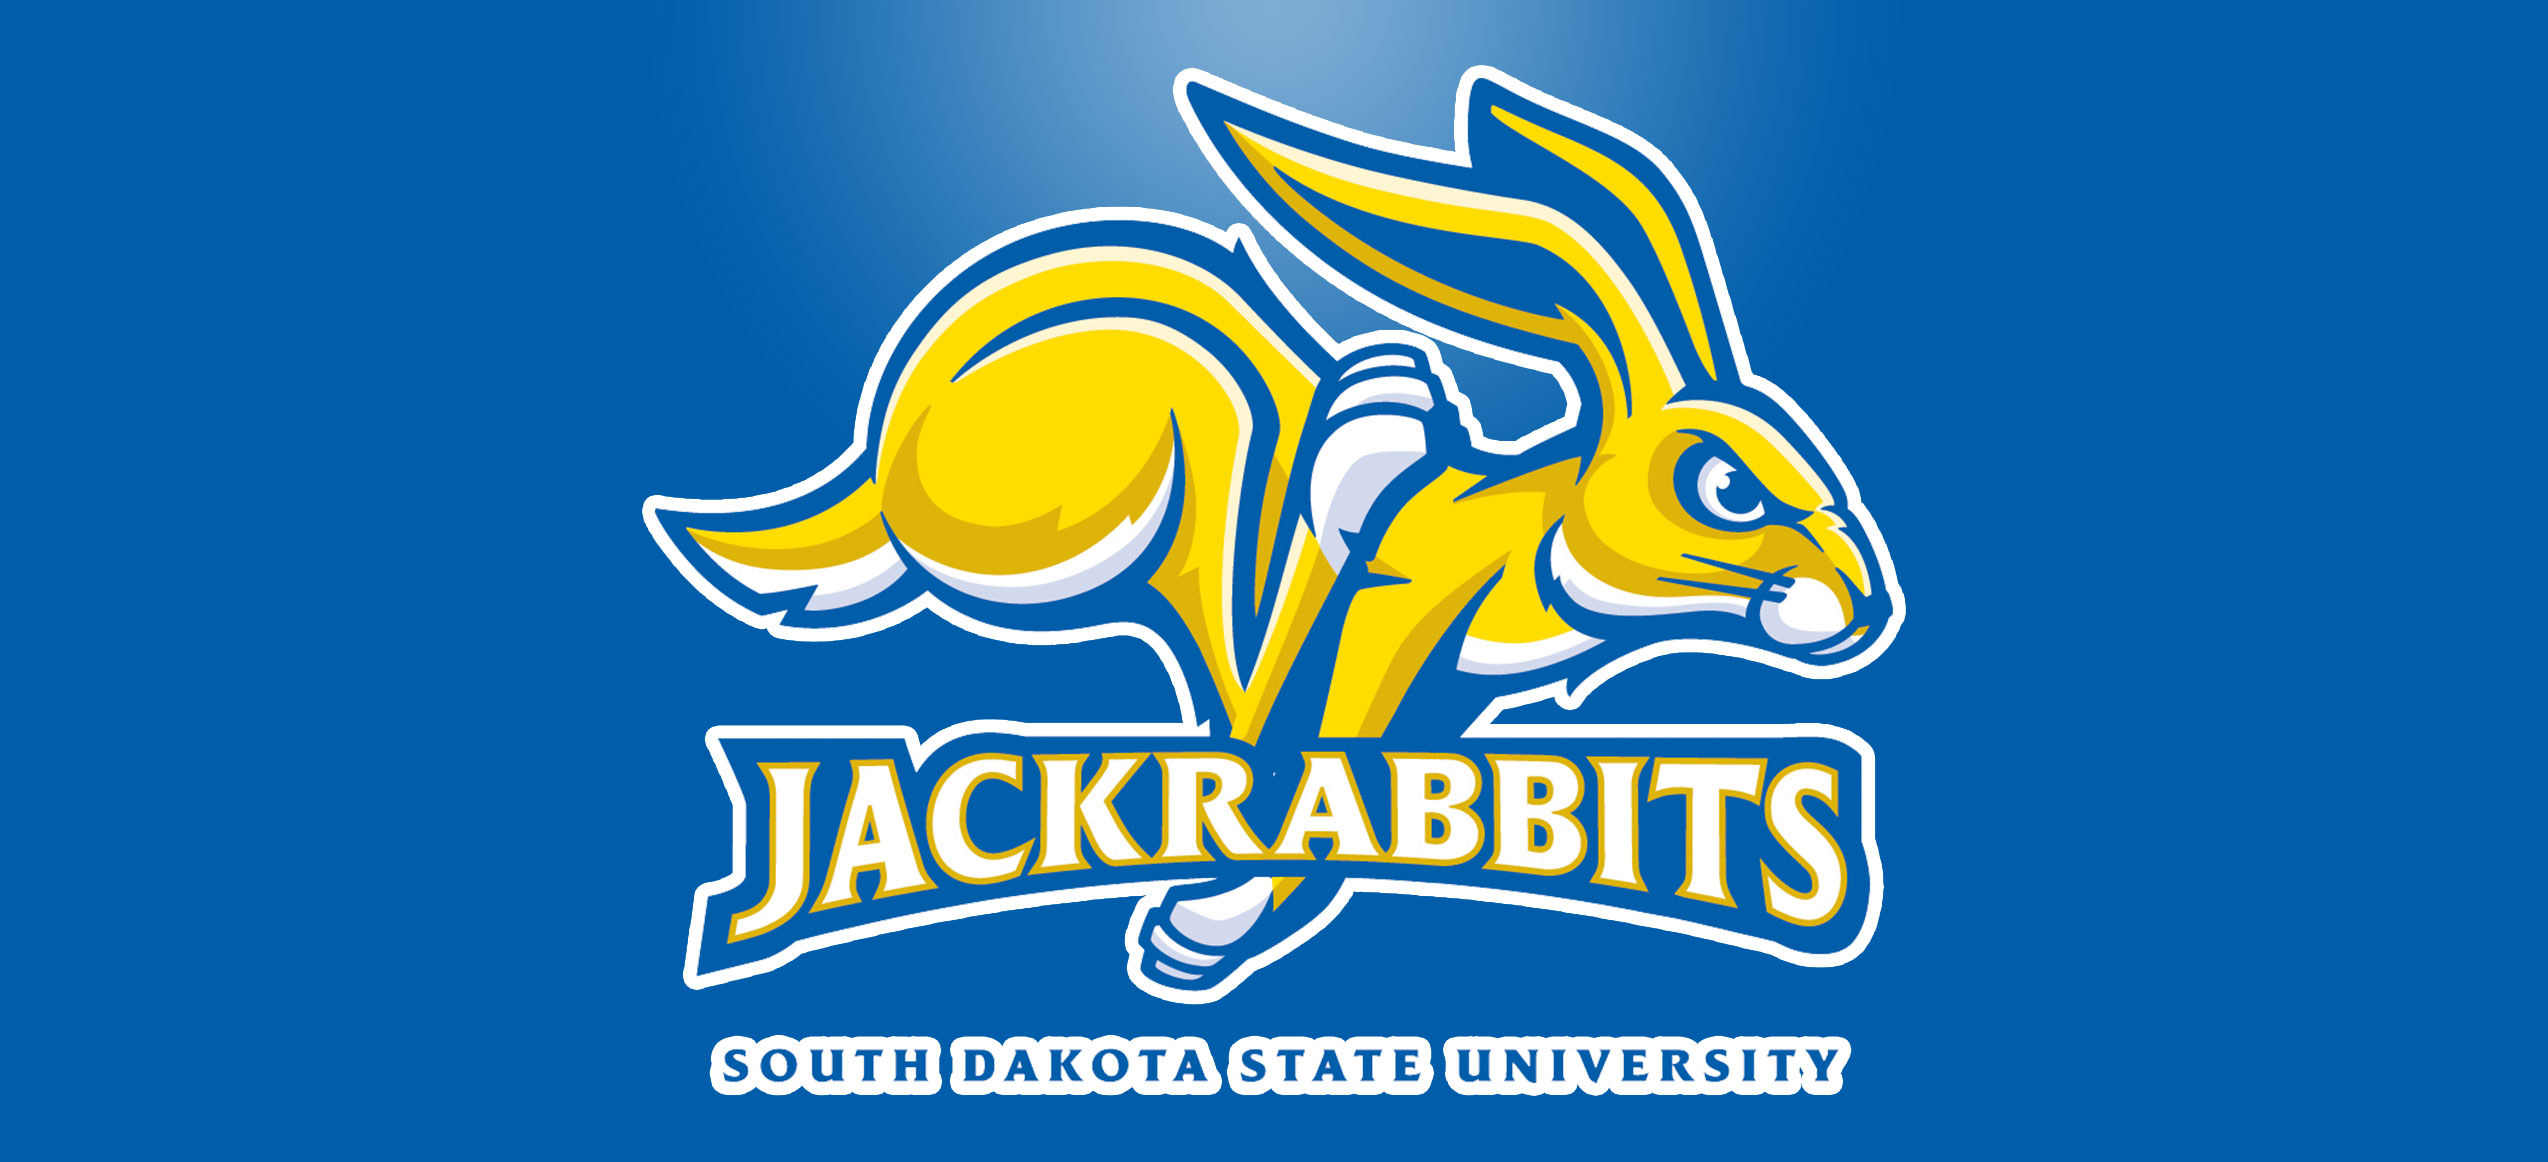 SDSU Jackrabbits South Dakota State University Jacks